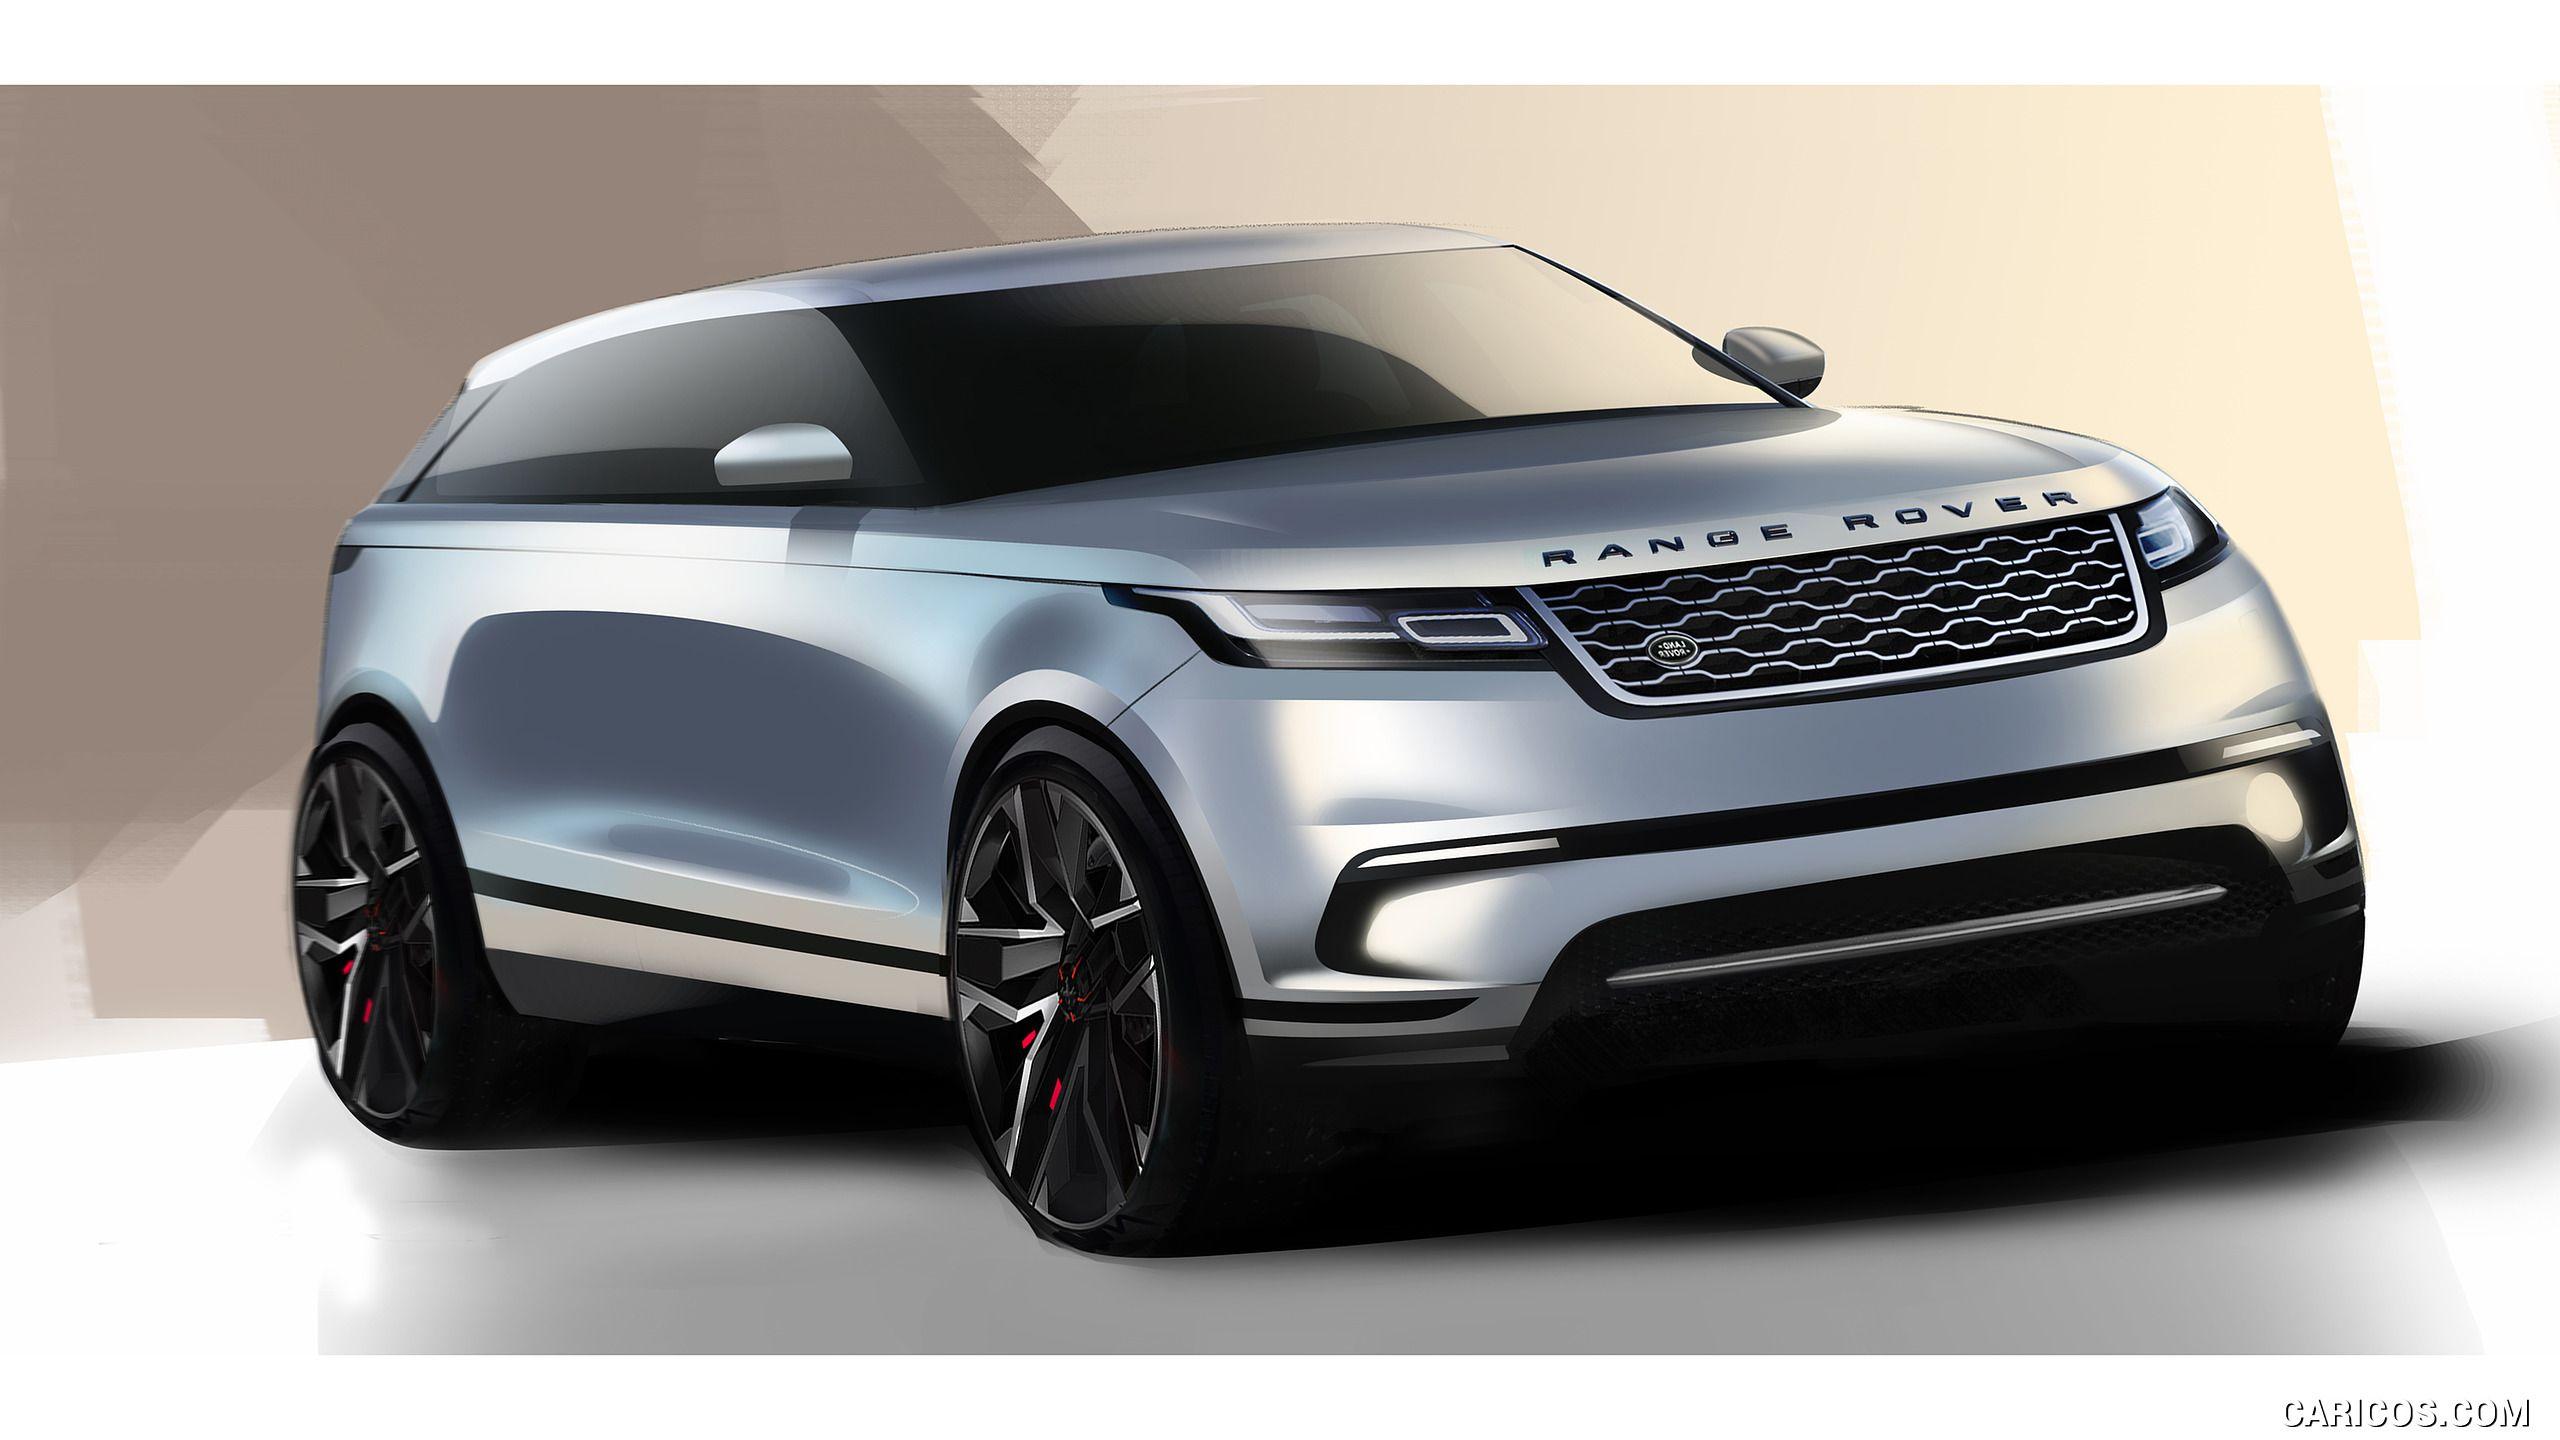 2018 Range Rover Velar Wallpaper 운송수단 디자인, 자동차, 디자인